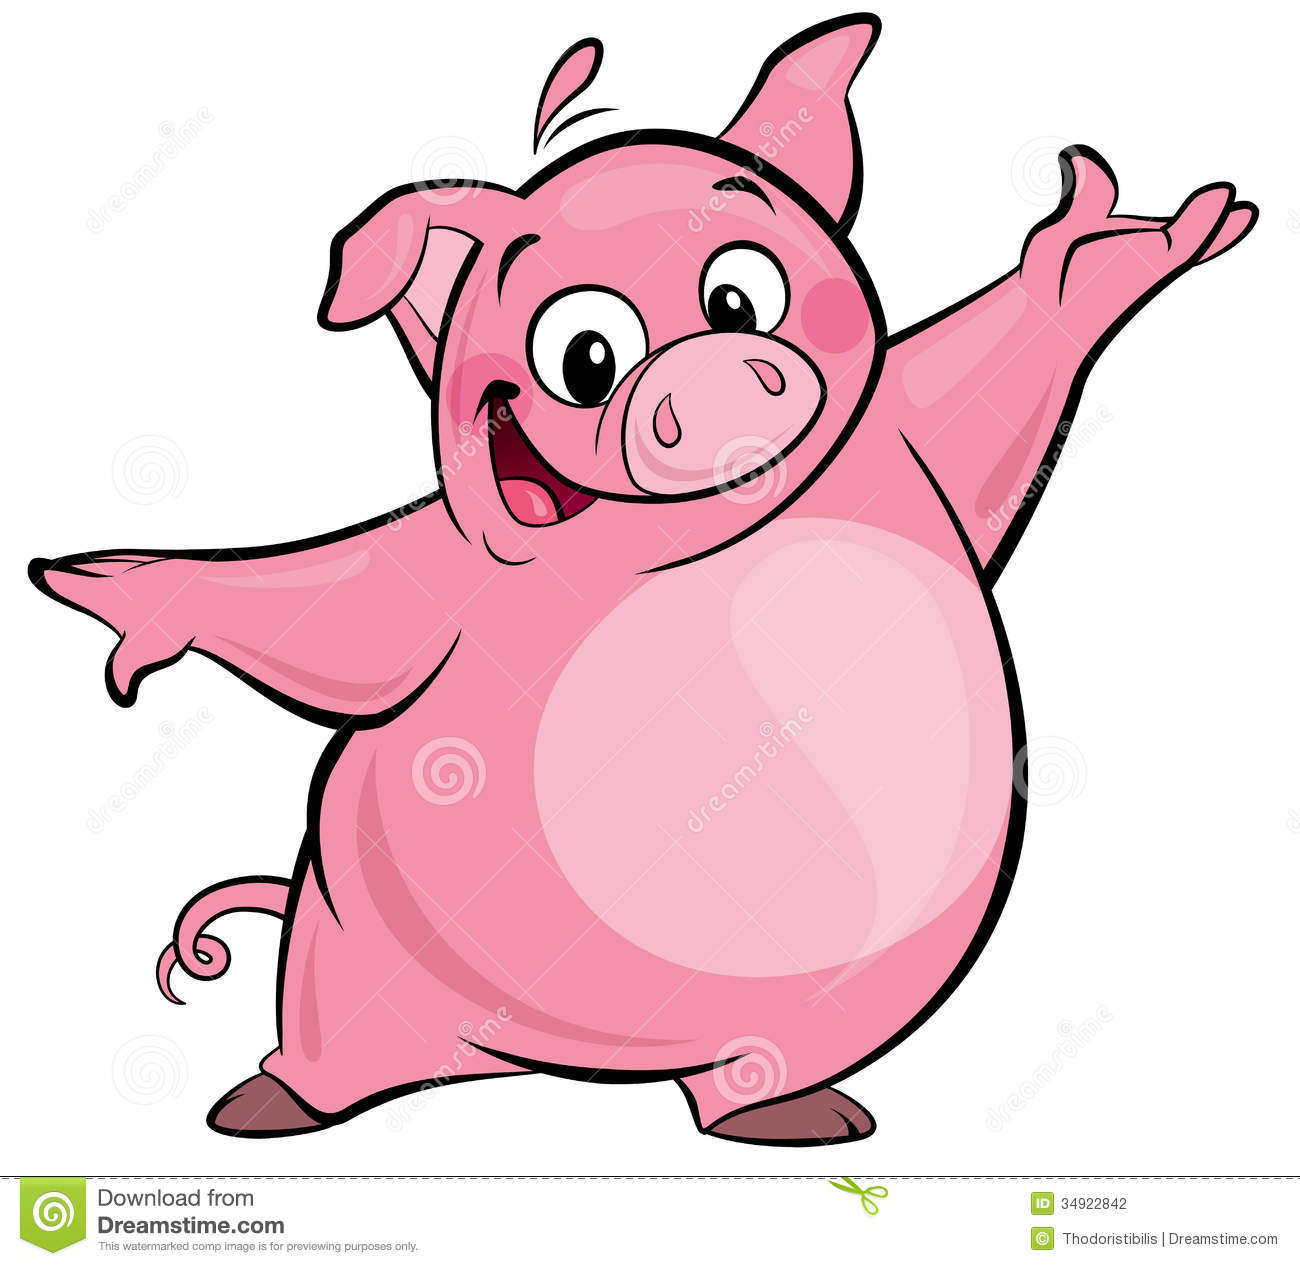 Pork clipart pink pig Pink Pig character Pig clipart